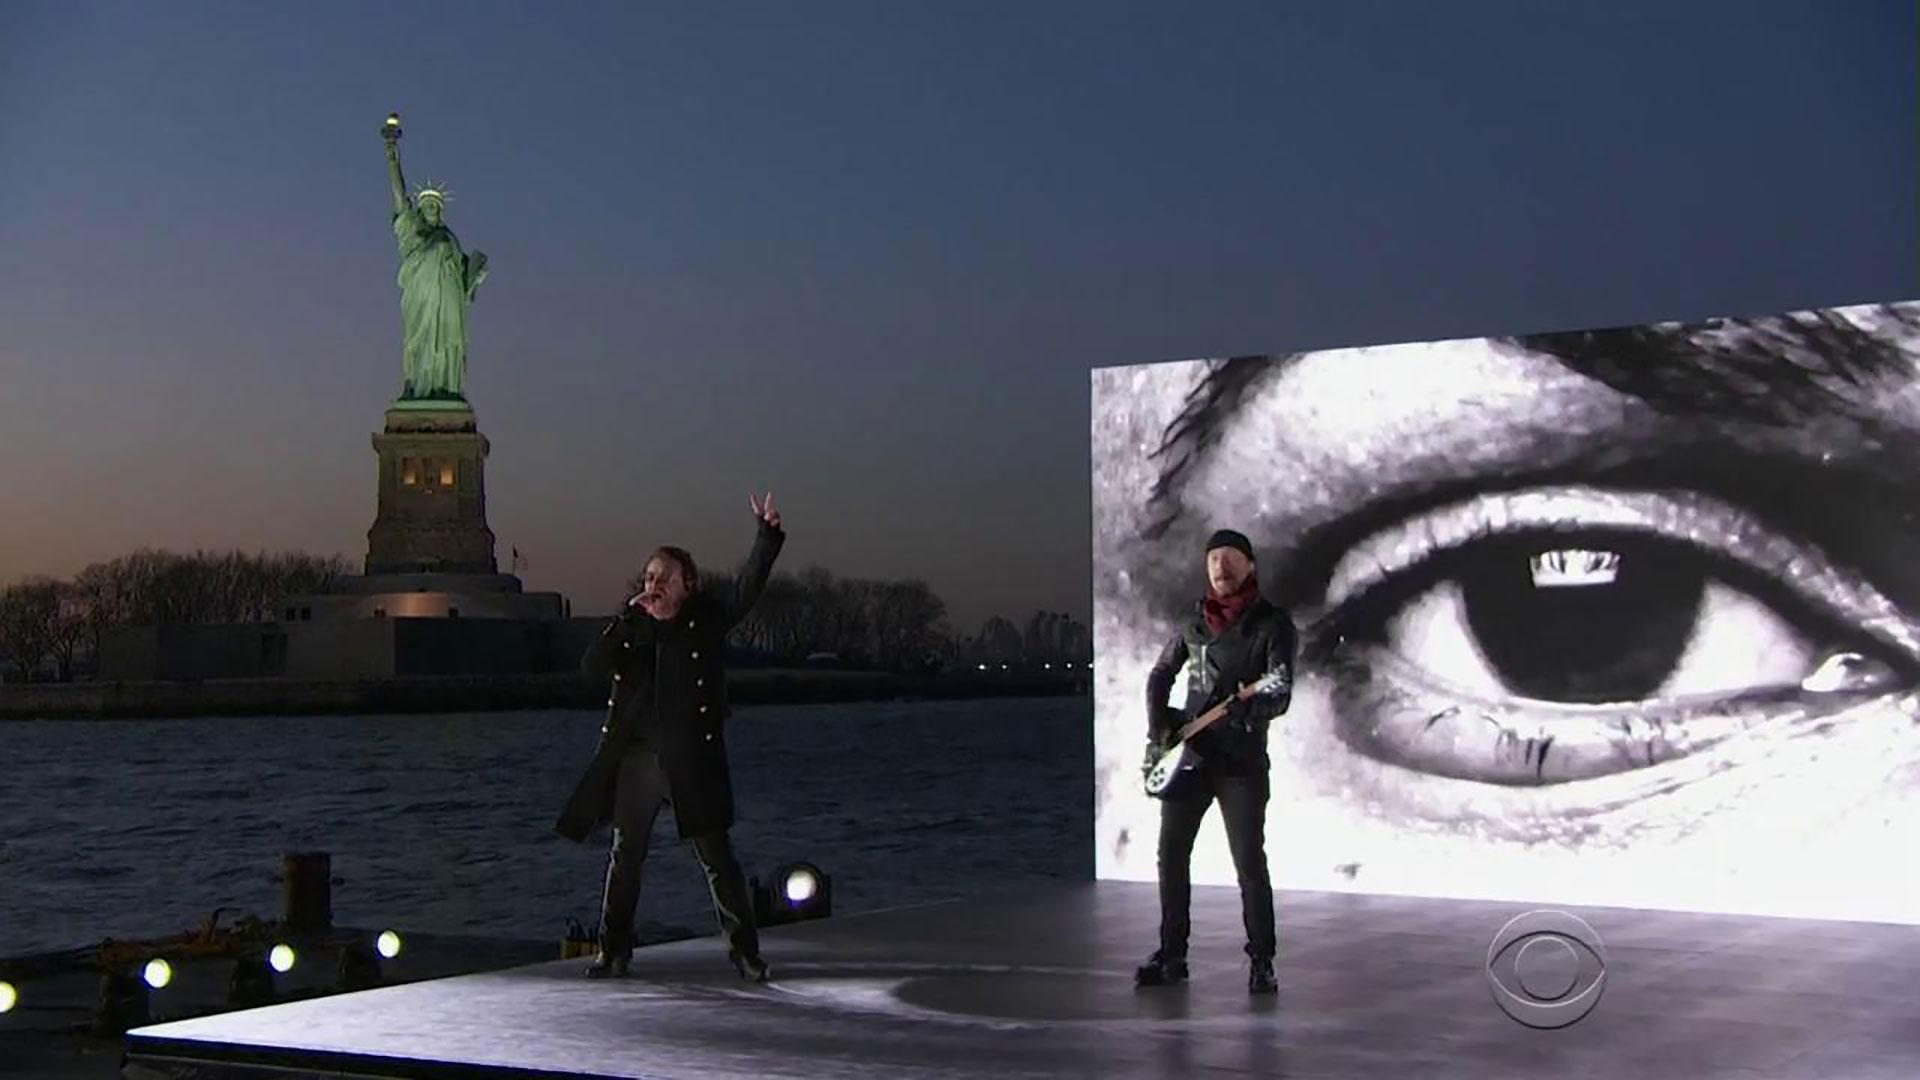 U2 perform their song